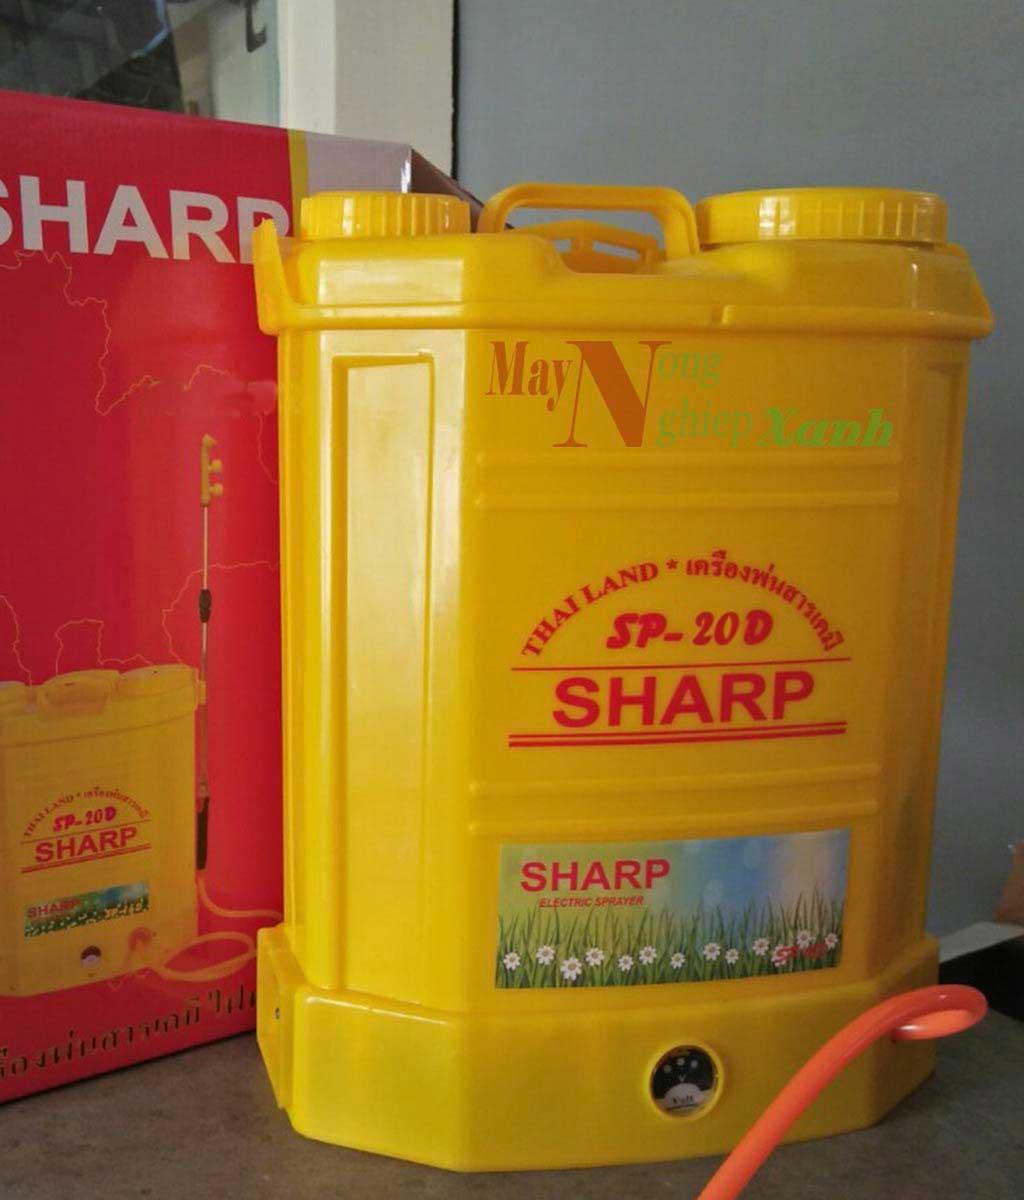 binh xit dien sharp SP 20D dung tich 20 lit - Bình xịt điện Sharp SP-20D dung tích 20 Lít